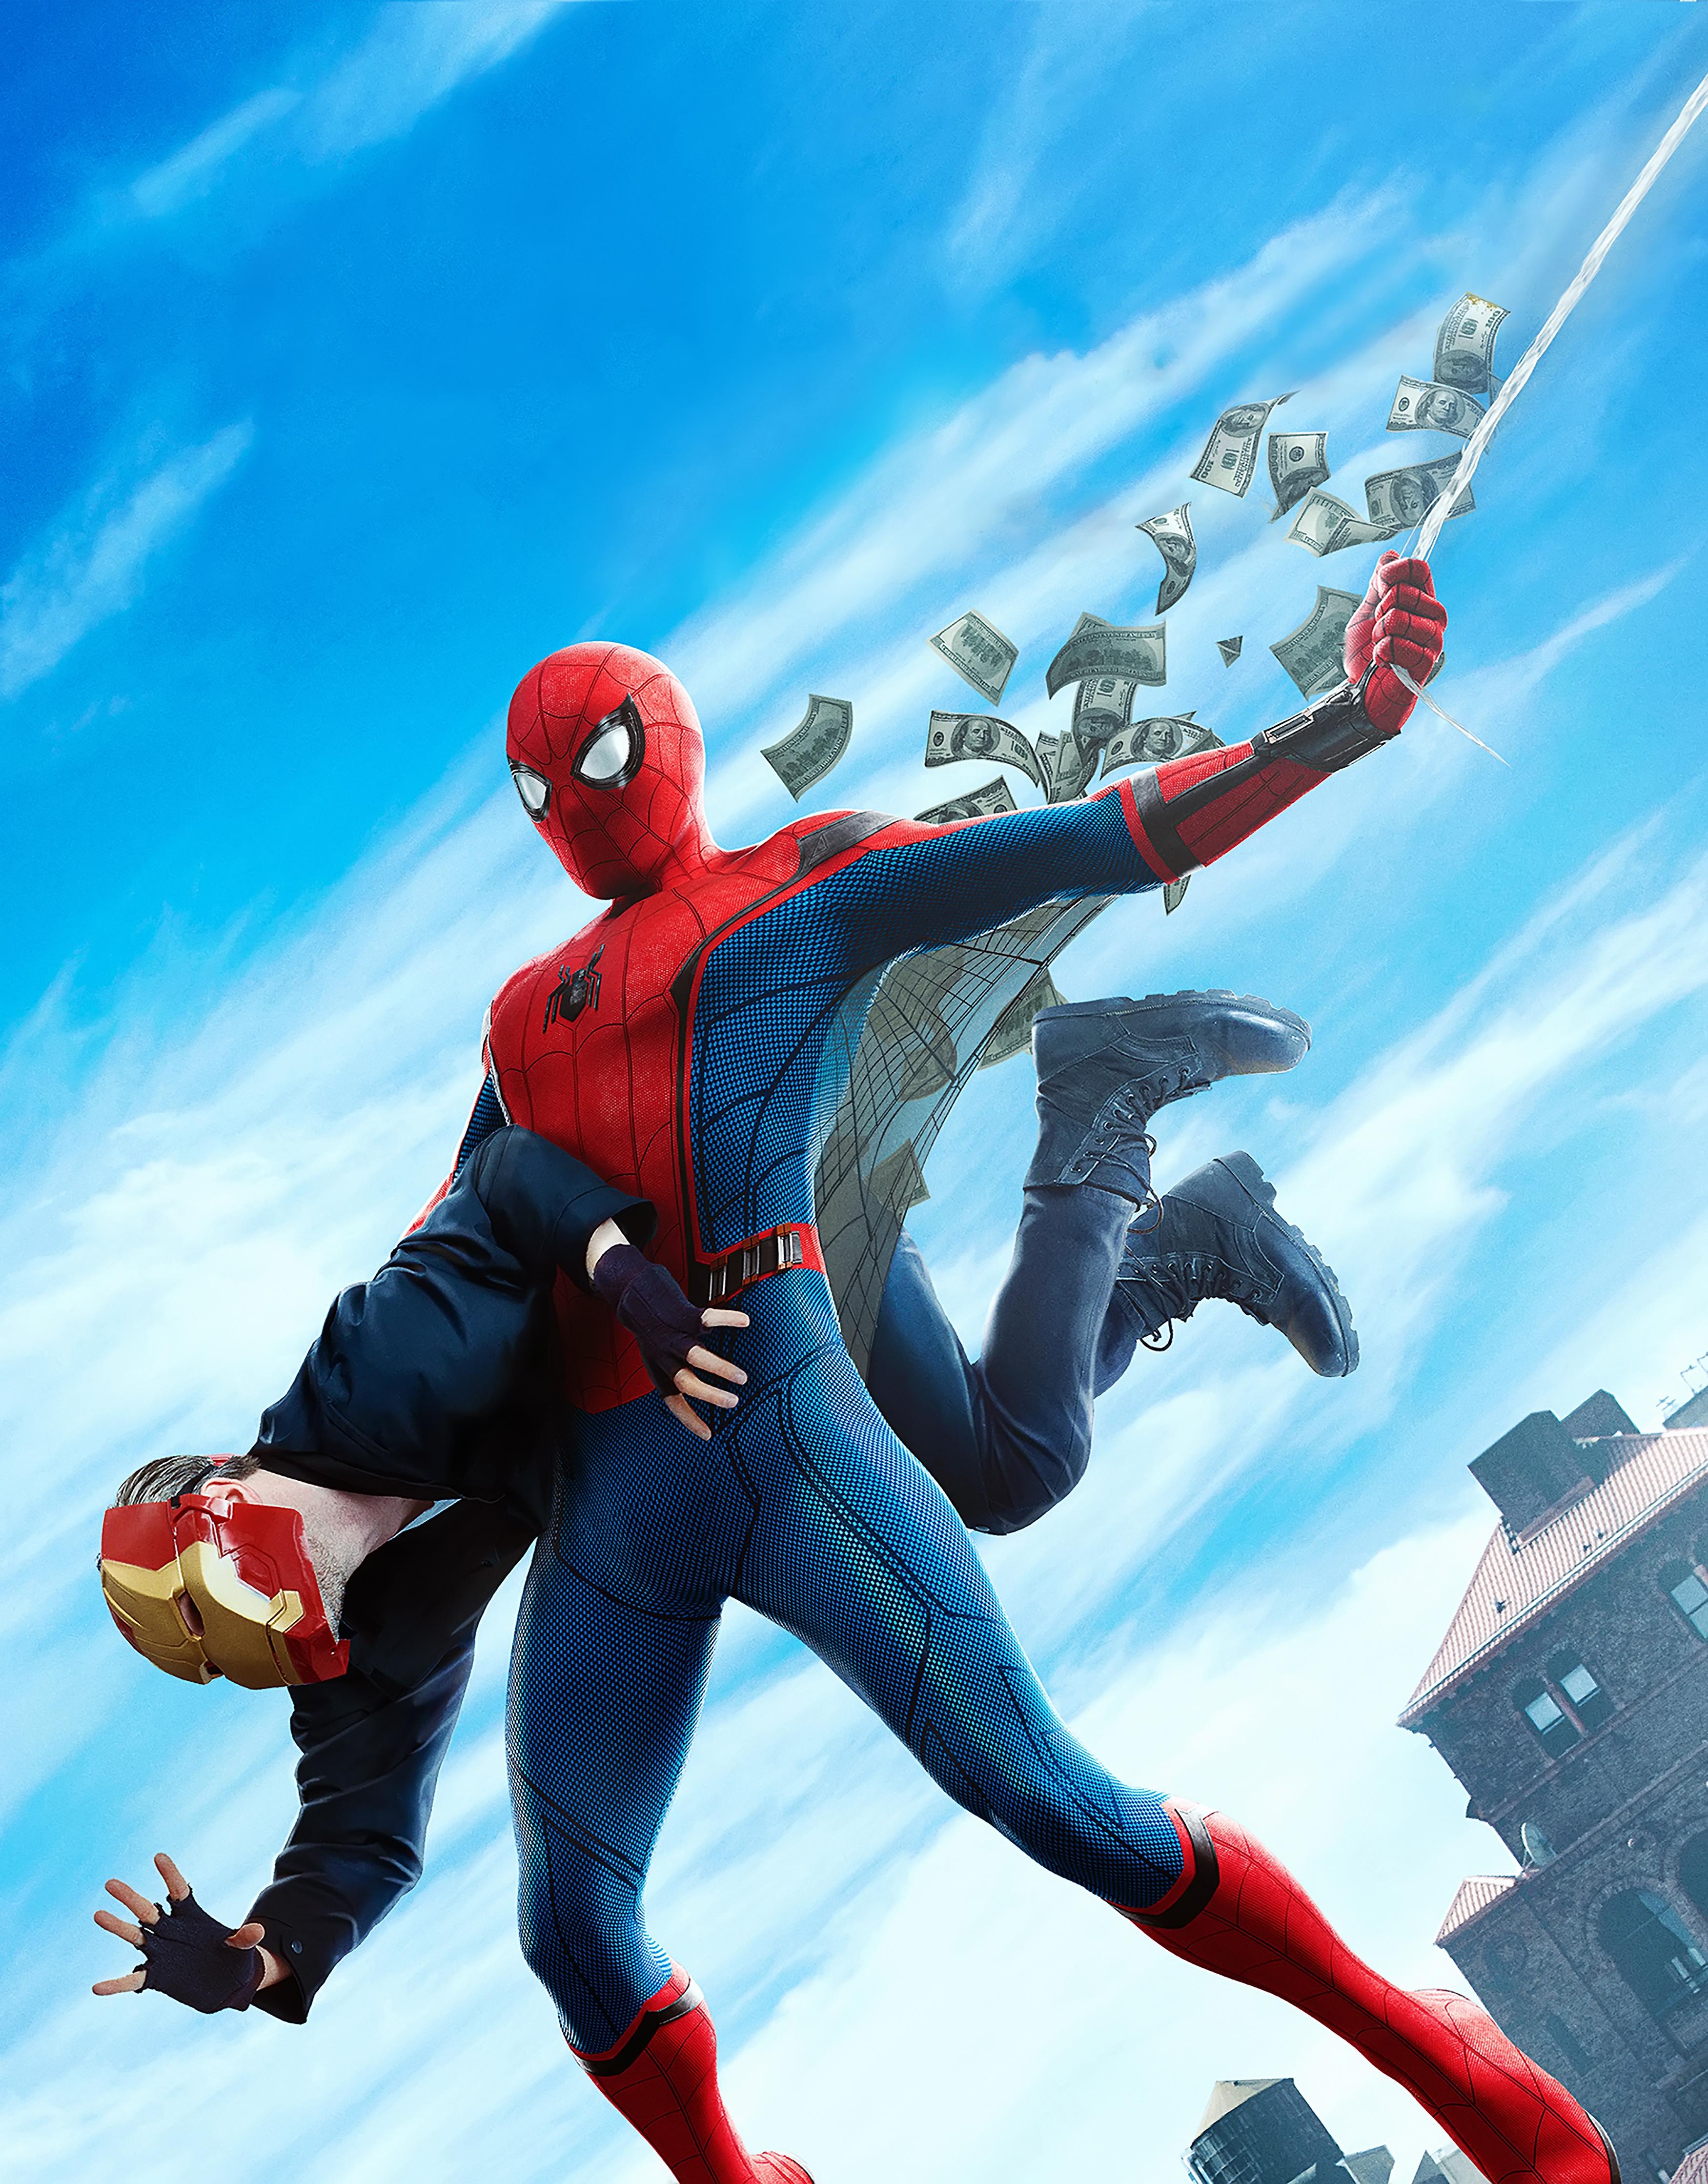 Desktop Wallpapers Spider-Man: Homecoming Heroes comics Spiderman hero film  for Mobile phone superheroes Movies